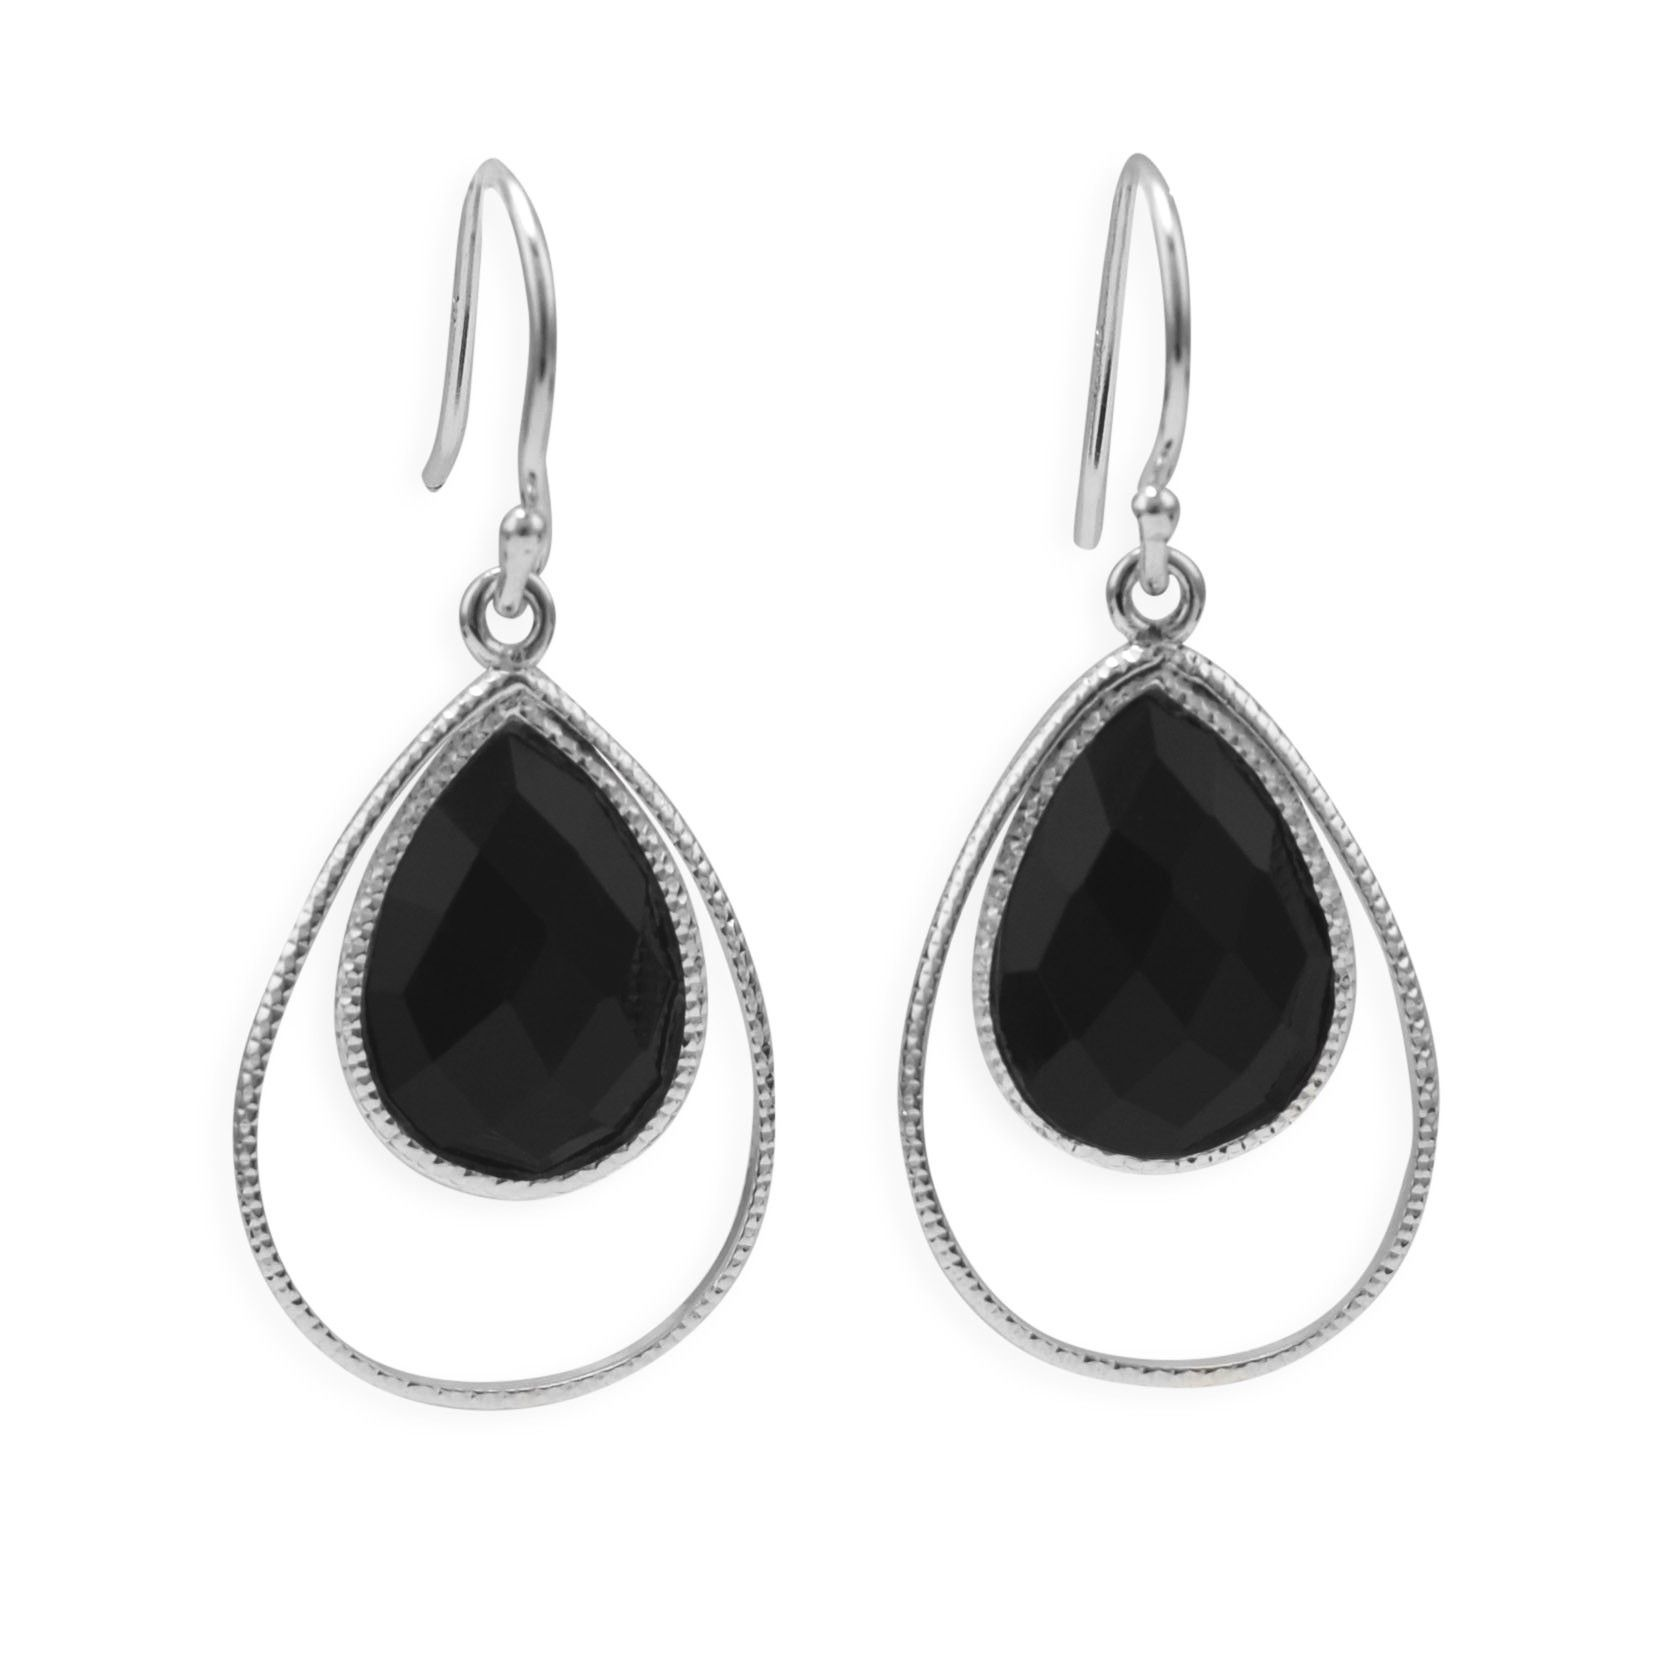 Sterling Silver Rings Earrings With Black Onyx Pear Drop